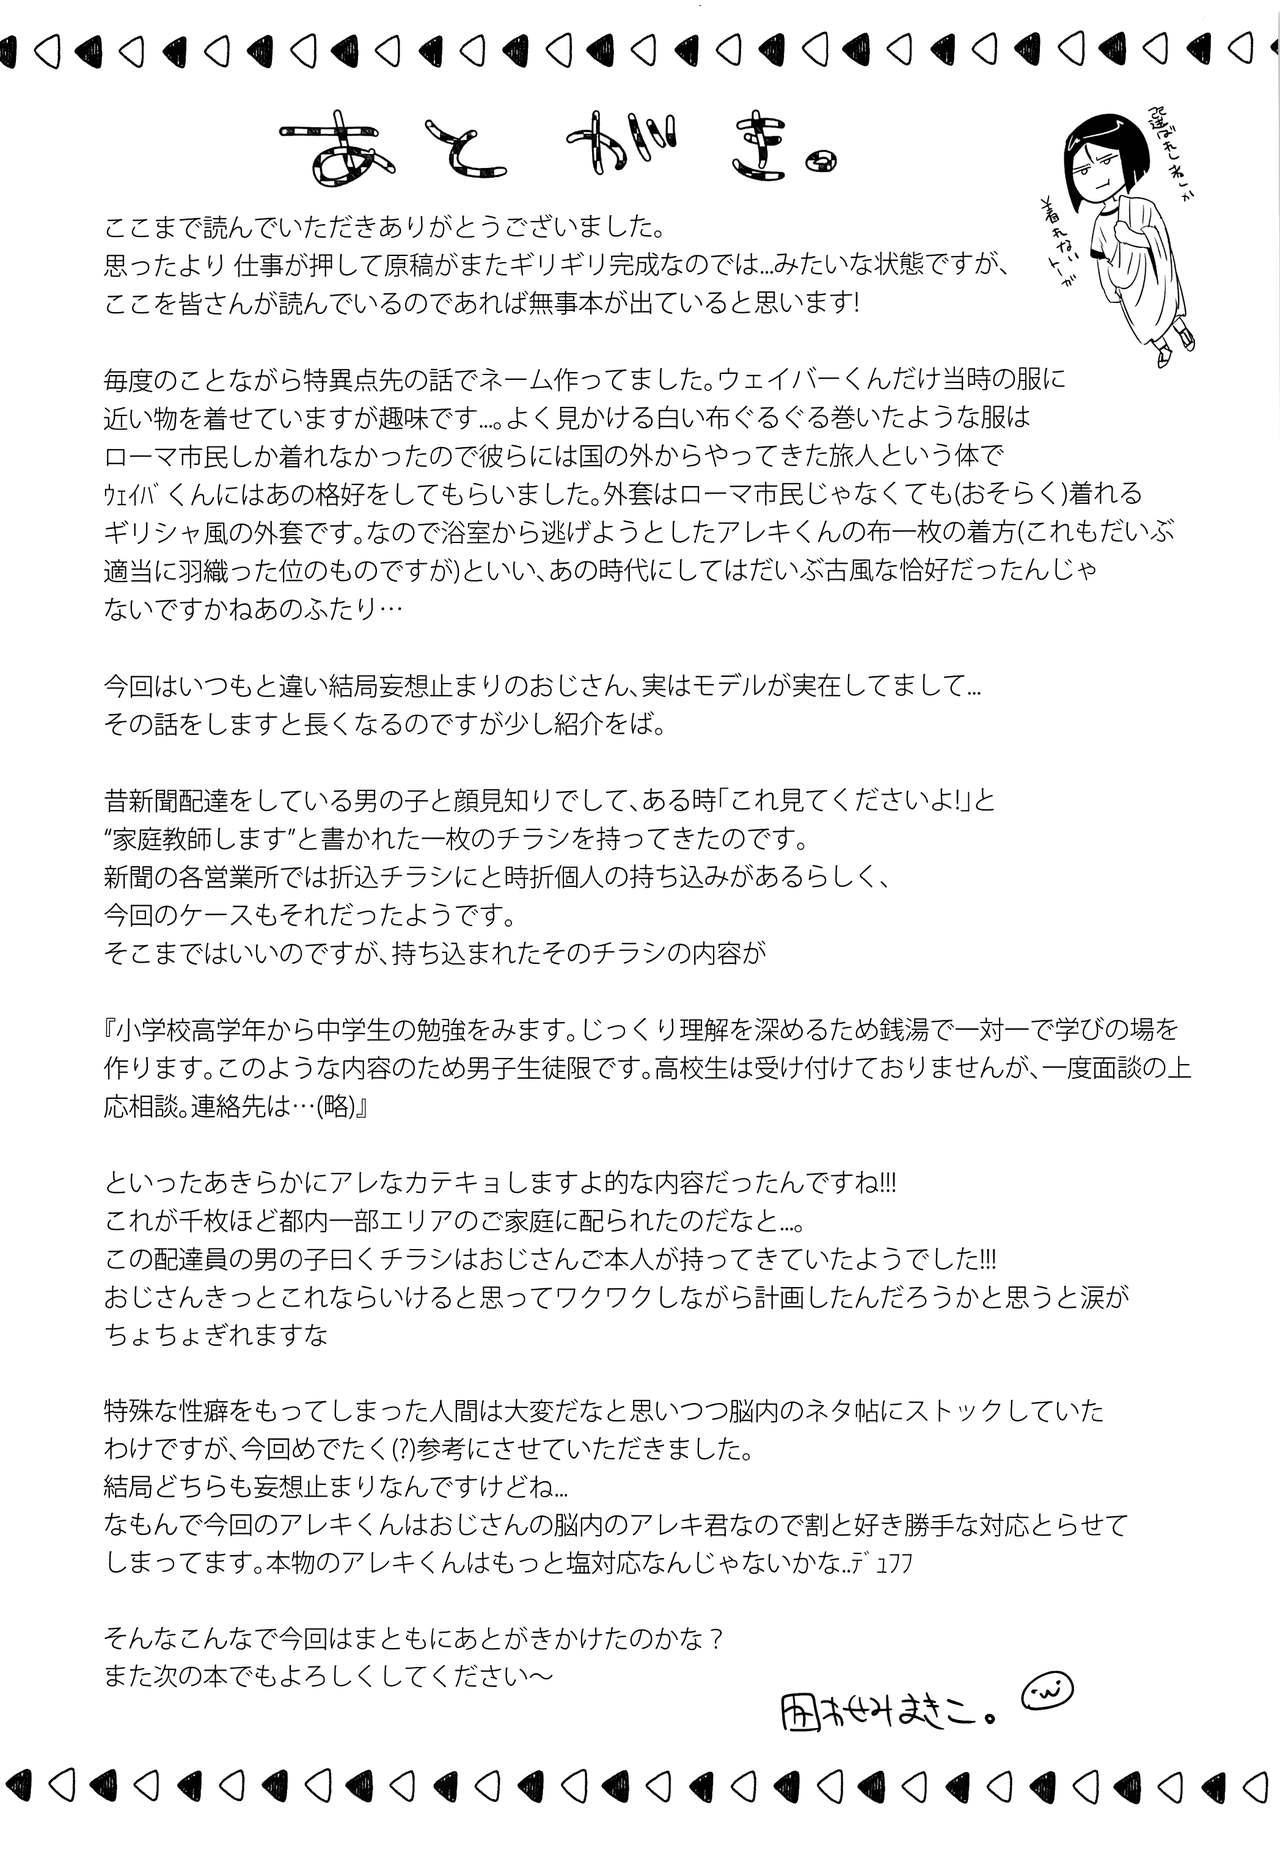 (C97) [Pocorit (Kawasemi Makiko)] Alex-kun to Rome Furo no Oji-san (Fate/Grand Order) [English] {Chin²} 21